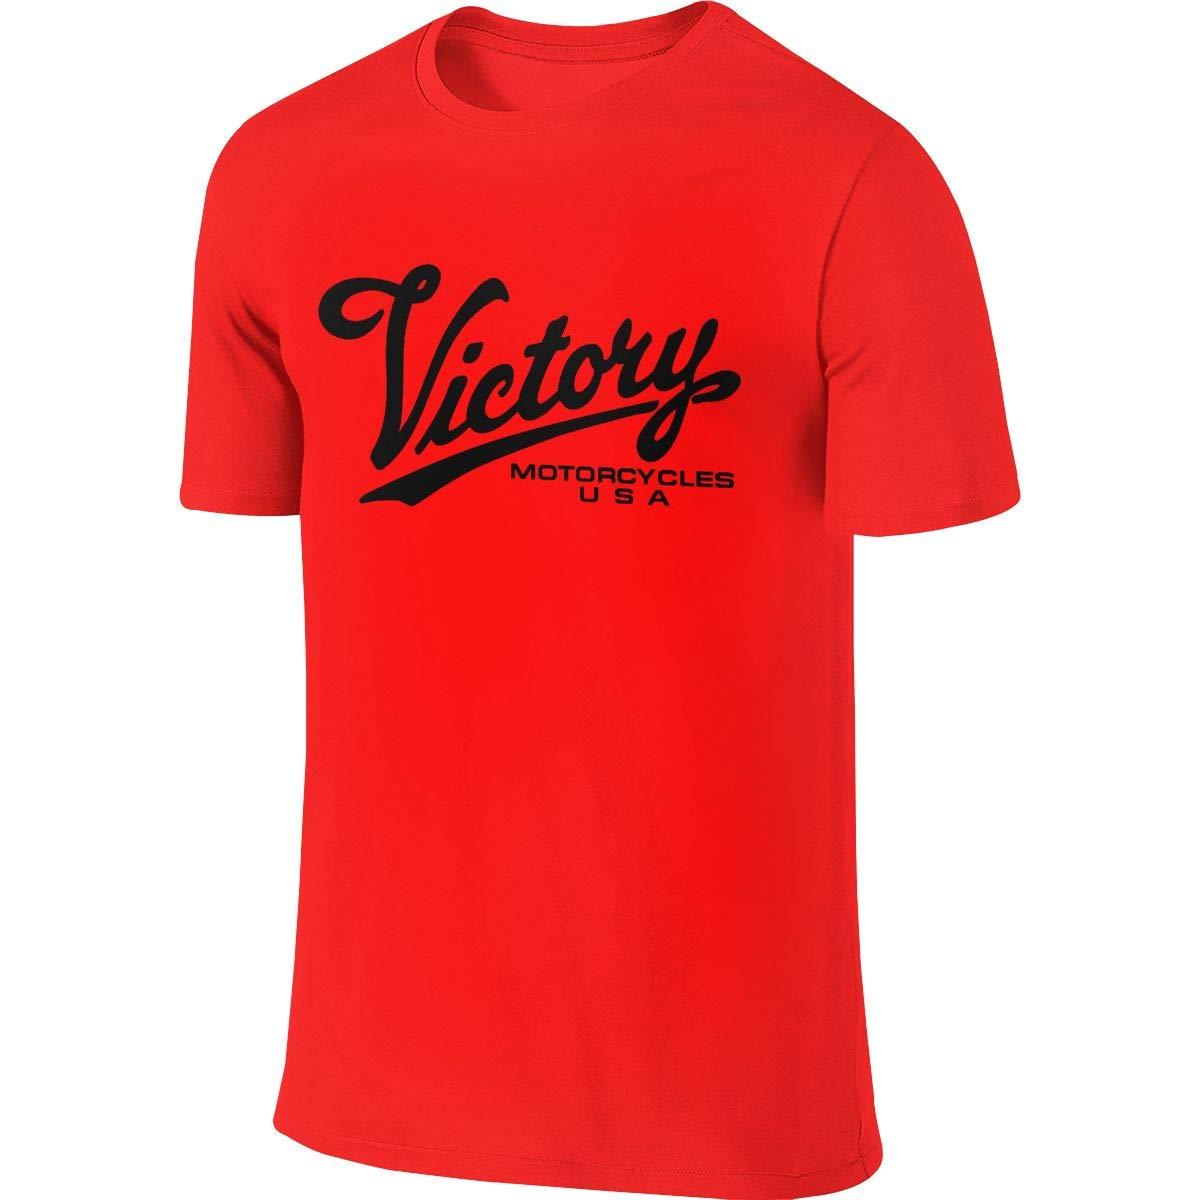 SHENGN Mens Custom Novelty Tops Victory Motorcycle Logo Tshirts